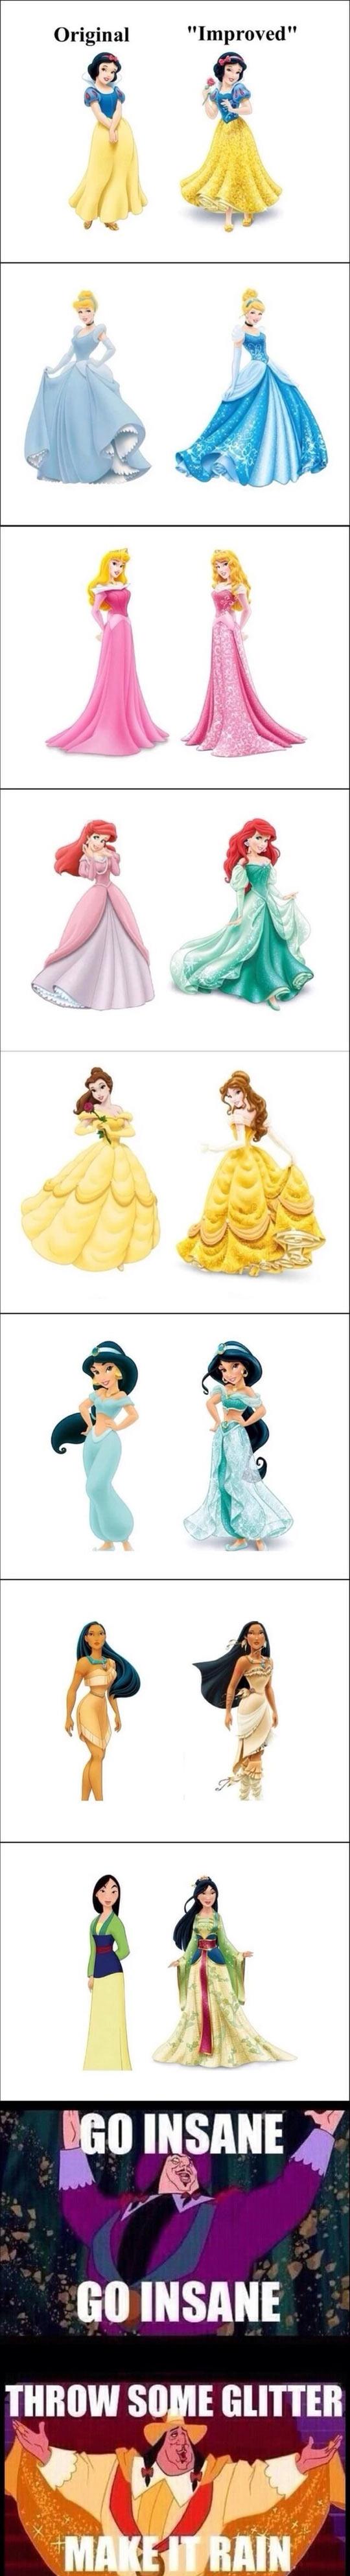 Improved Disney Princesses